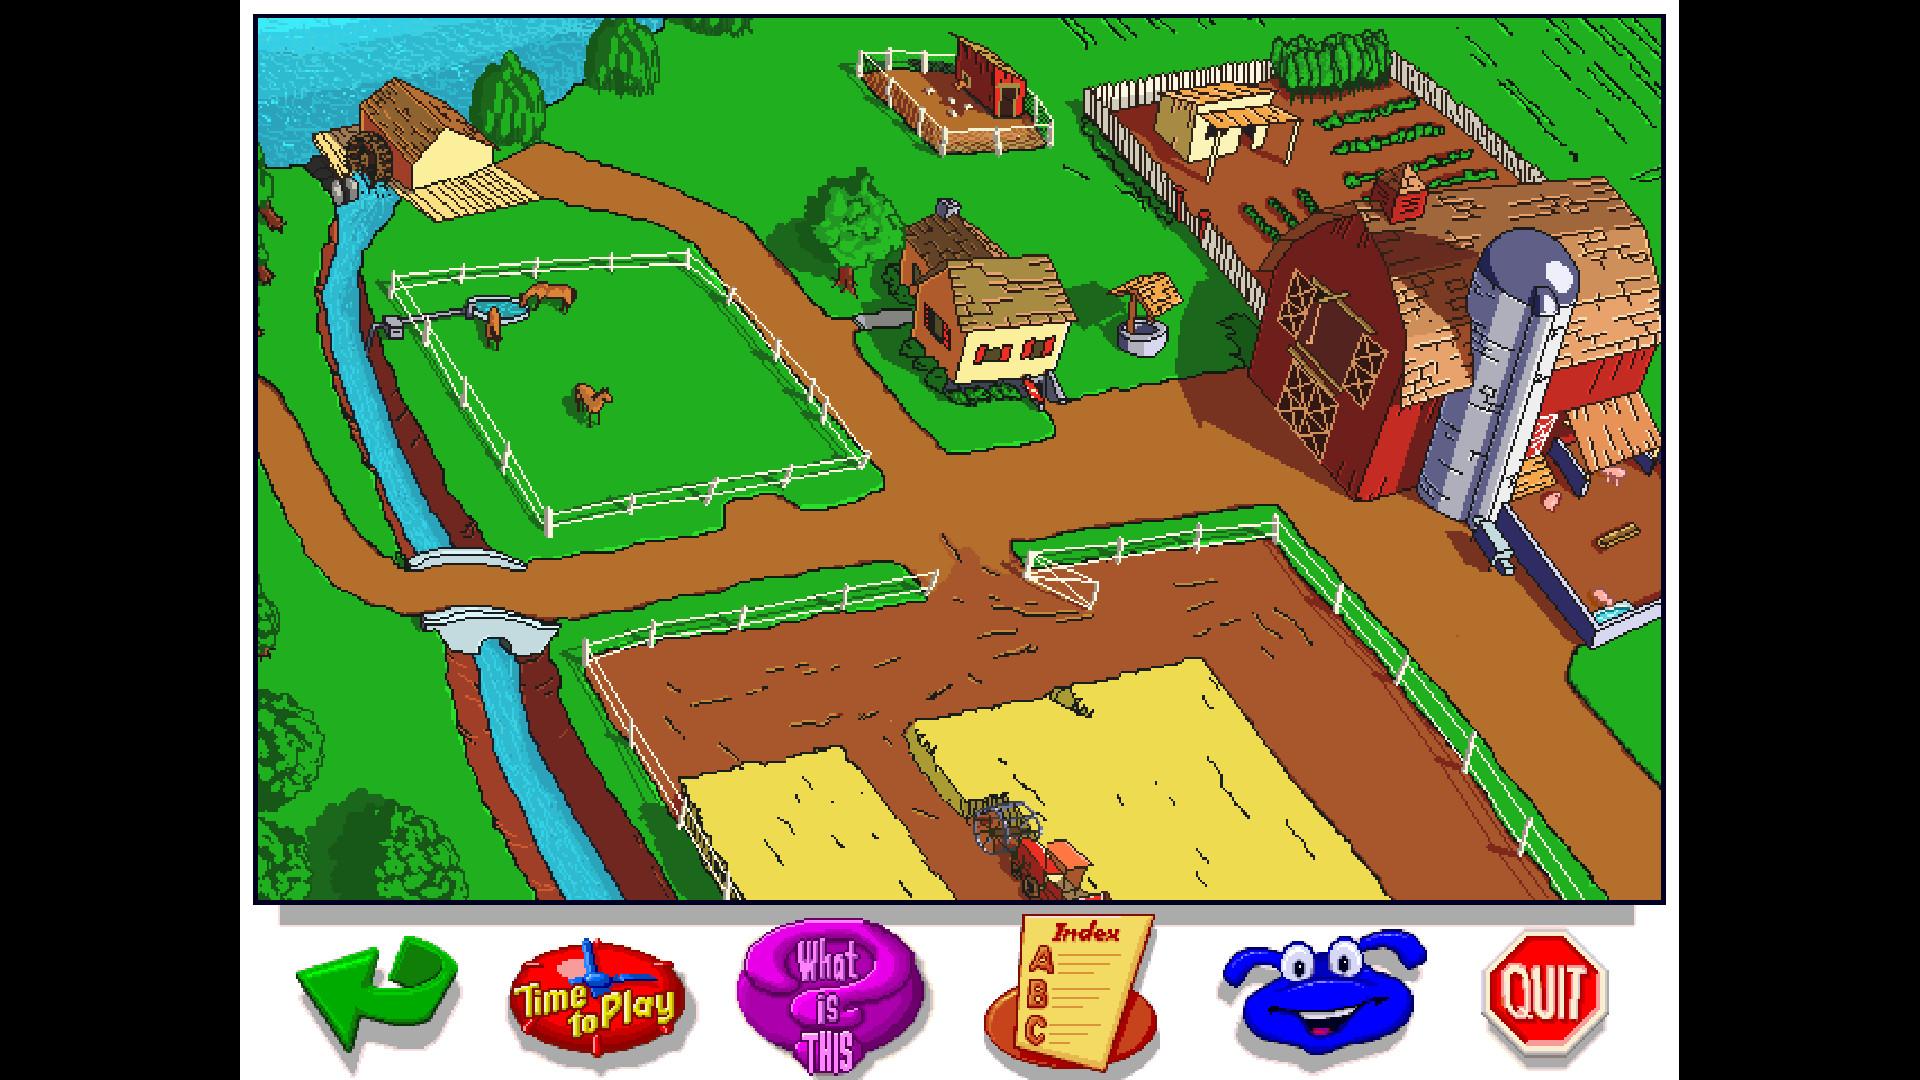 Let's Explore the Farm (Junior Field Trips) screenshot